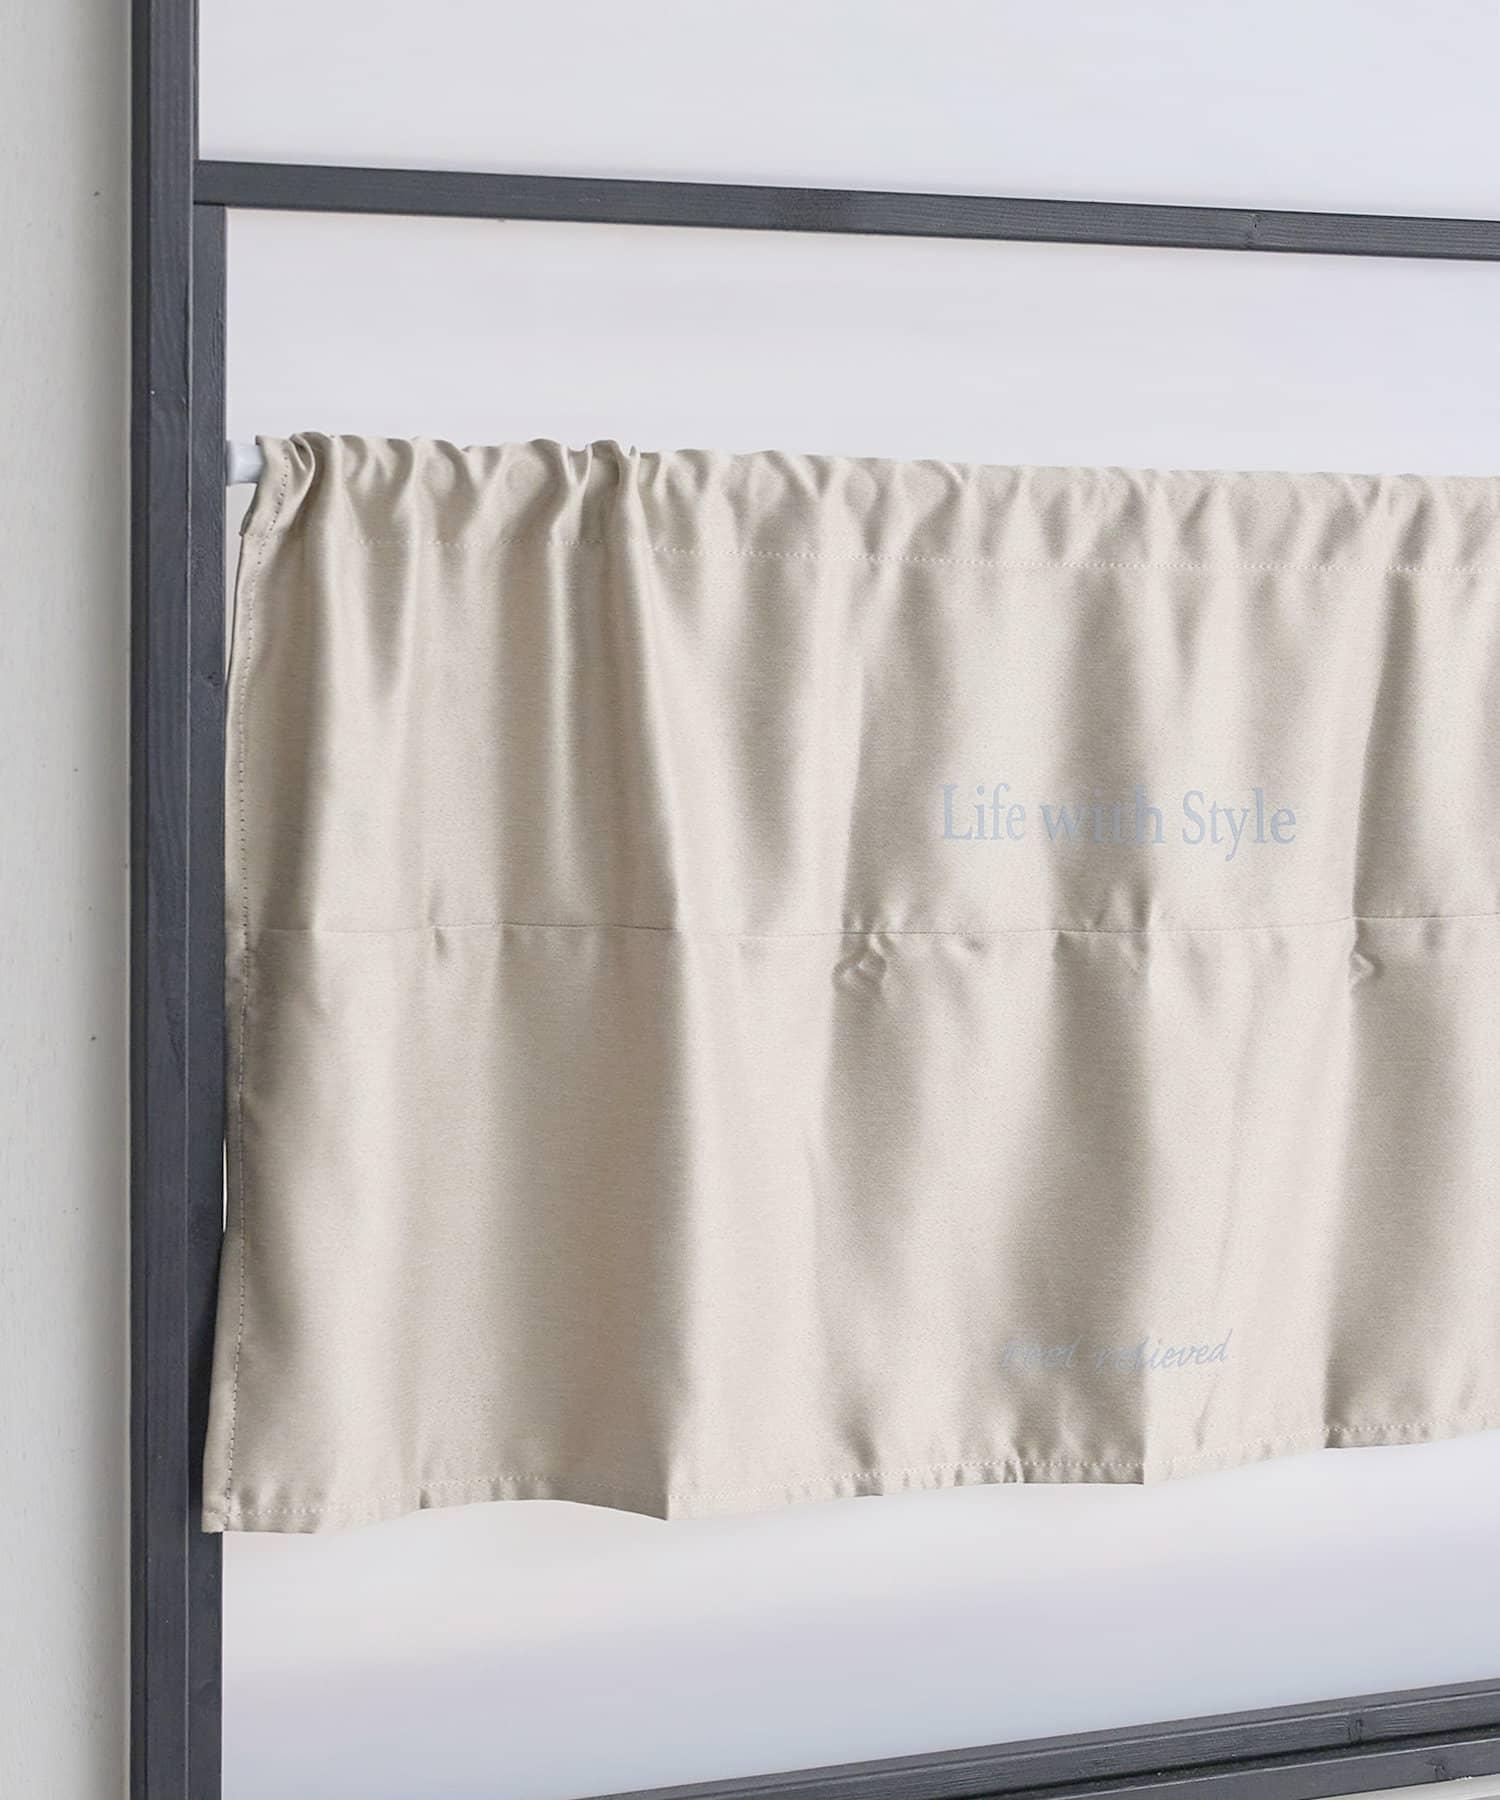 3COINS(スリーコインズ) ライフスタイル 遮光カフェカーテン アイボリー